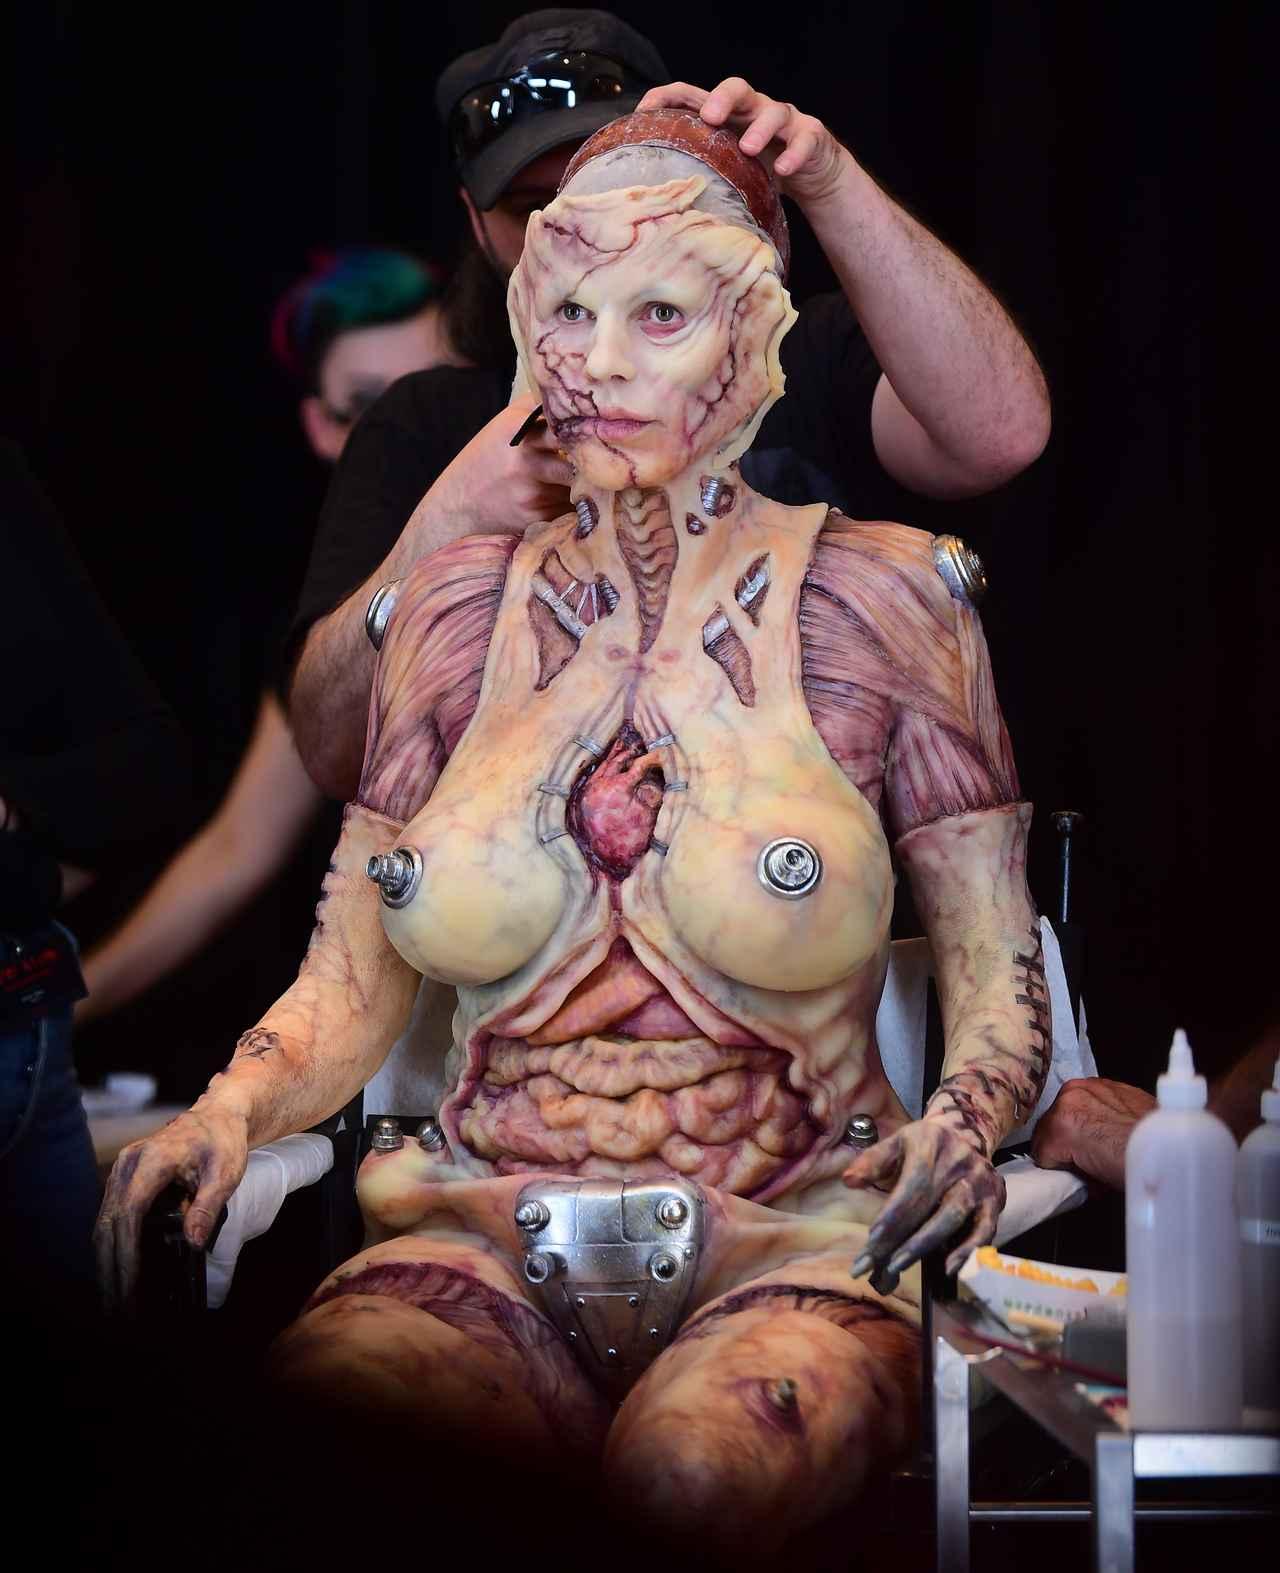 Images : 10番目の画像 - 「ハロウィンの女王」ハイディ・クルムの仮装が怖すぎる - フロントロウ -海外セレブ情報を発信